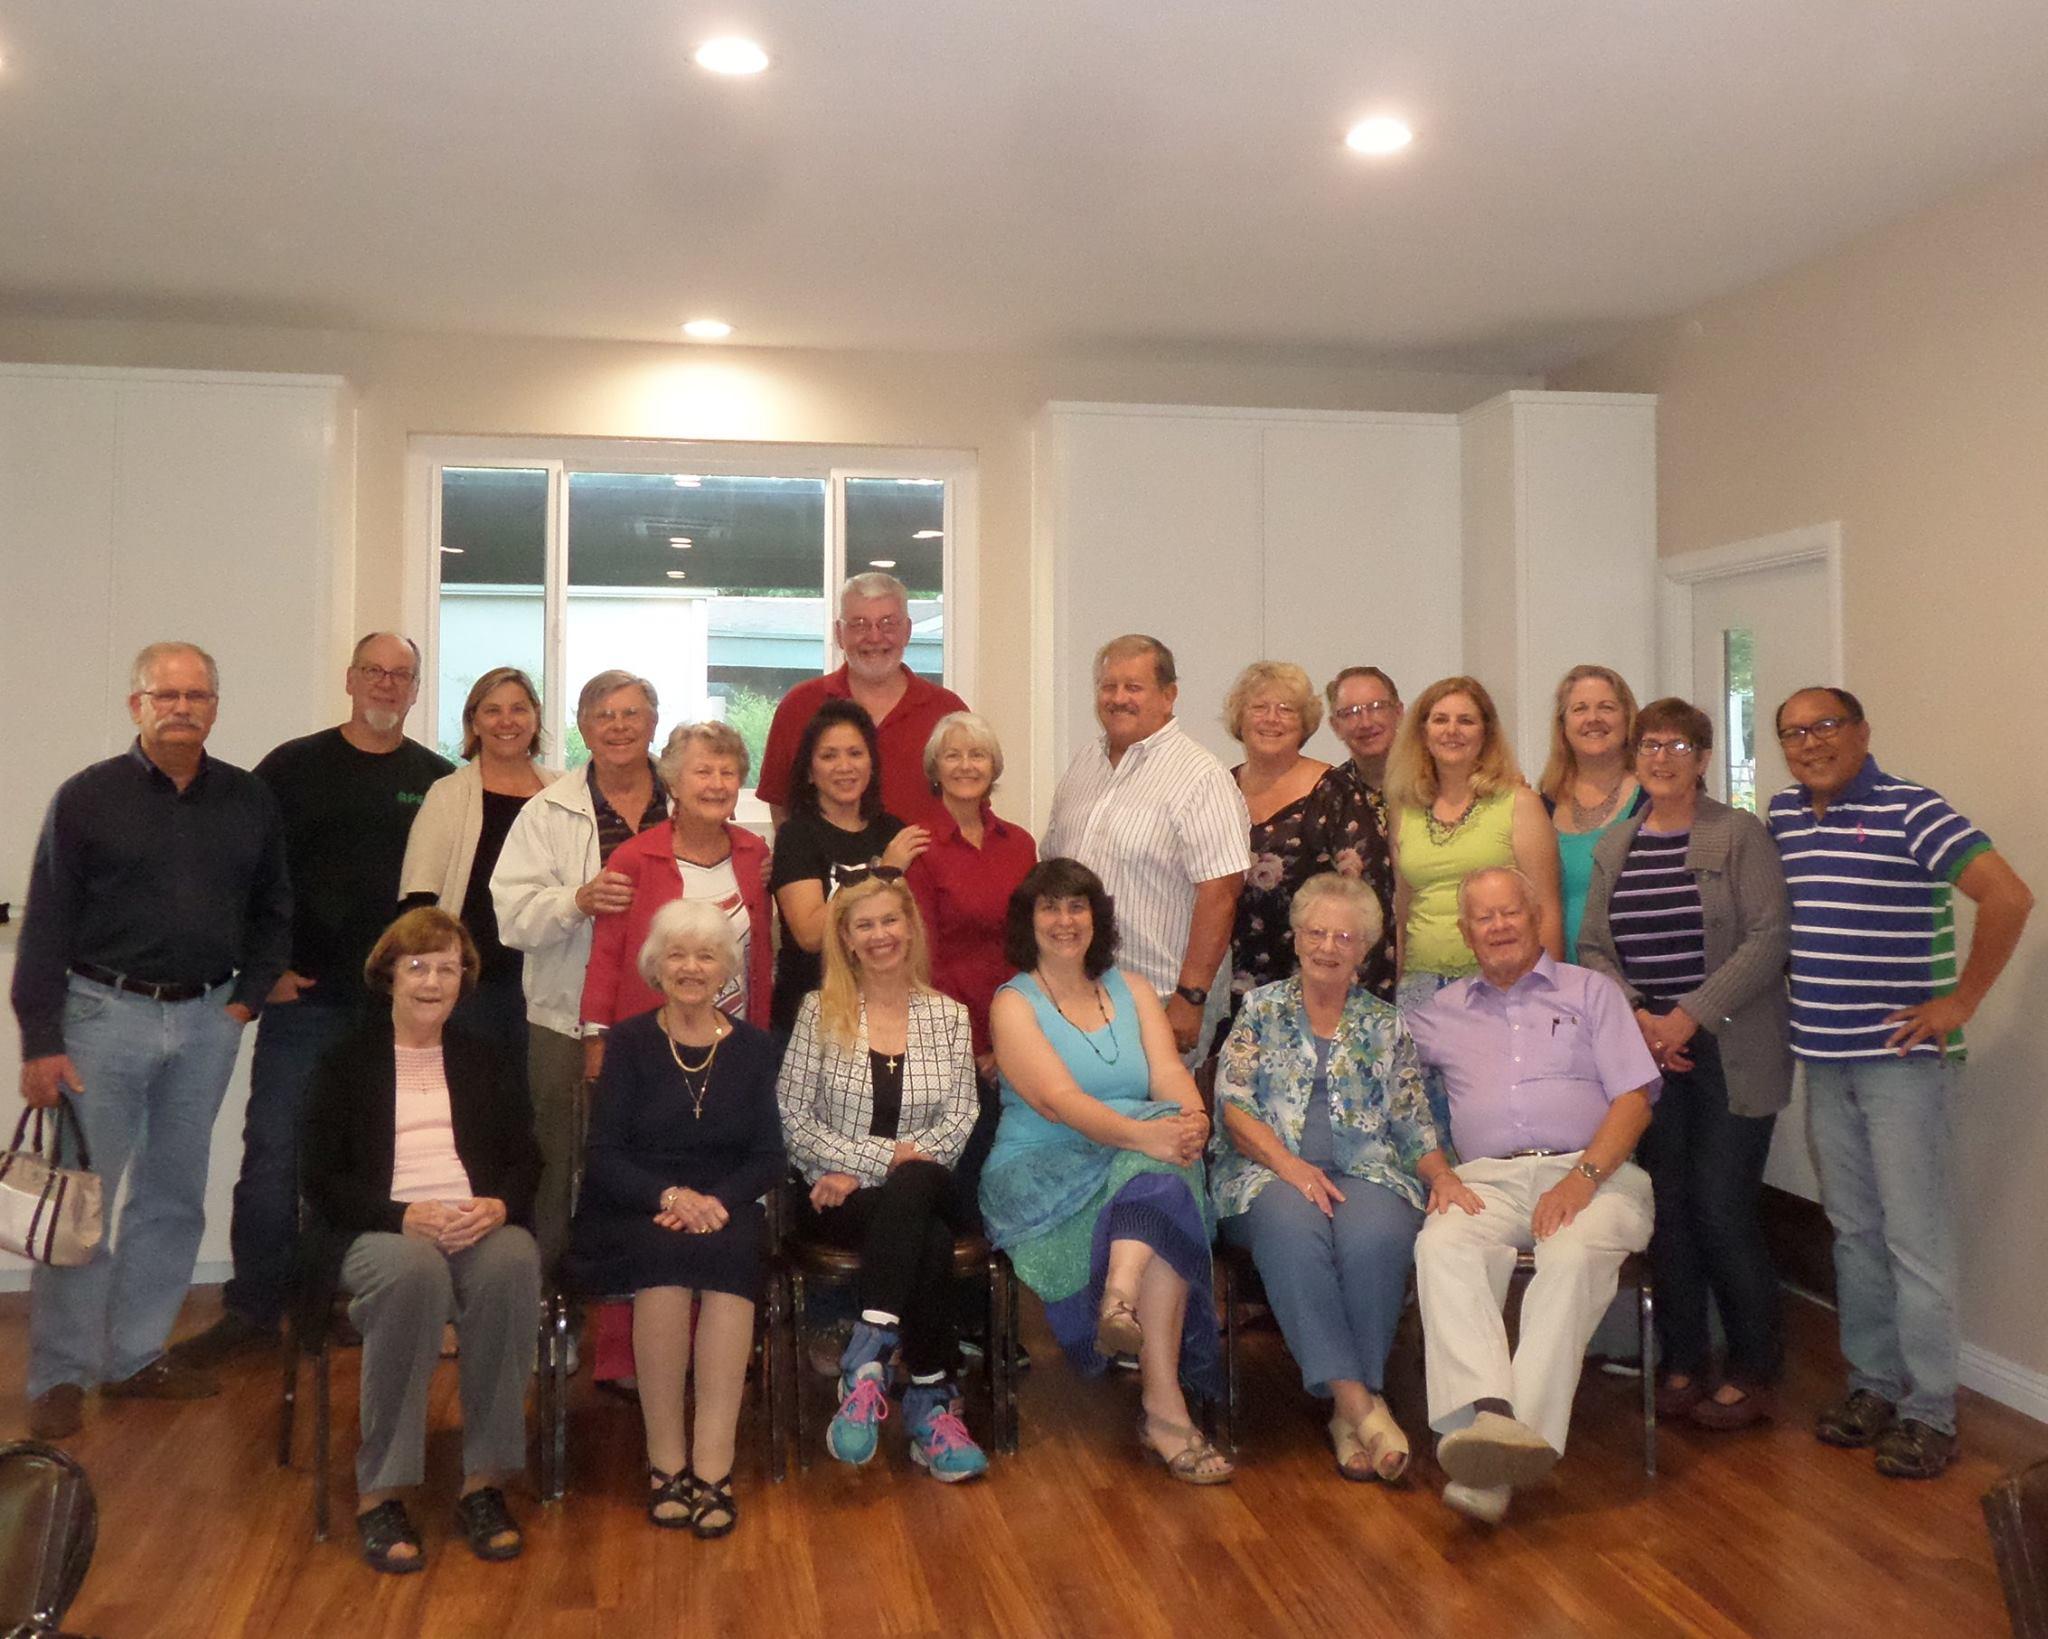 claremont-presbyterian-church-members-community.jpg